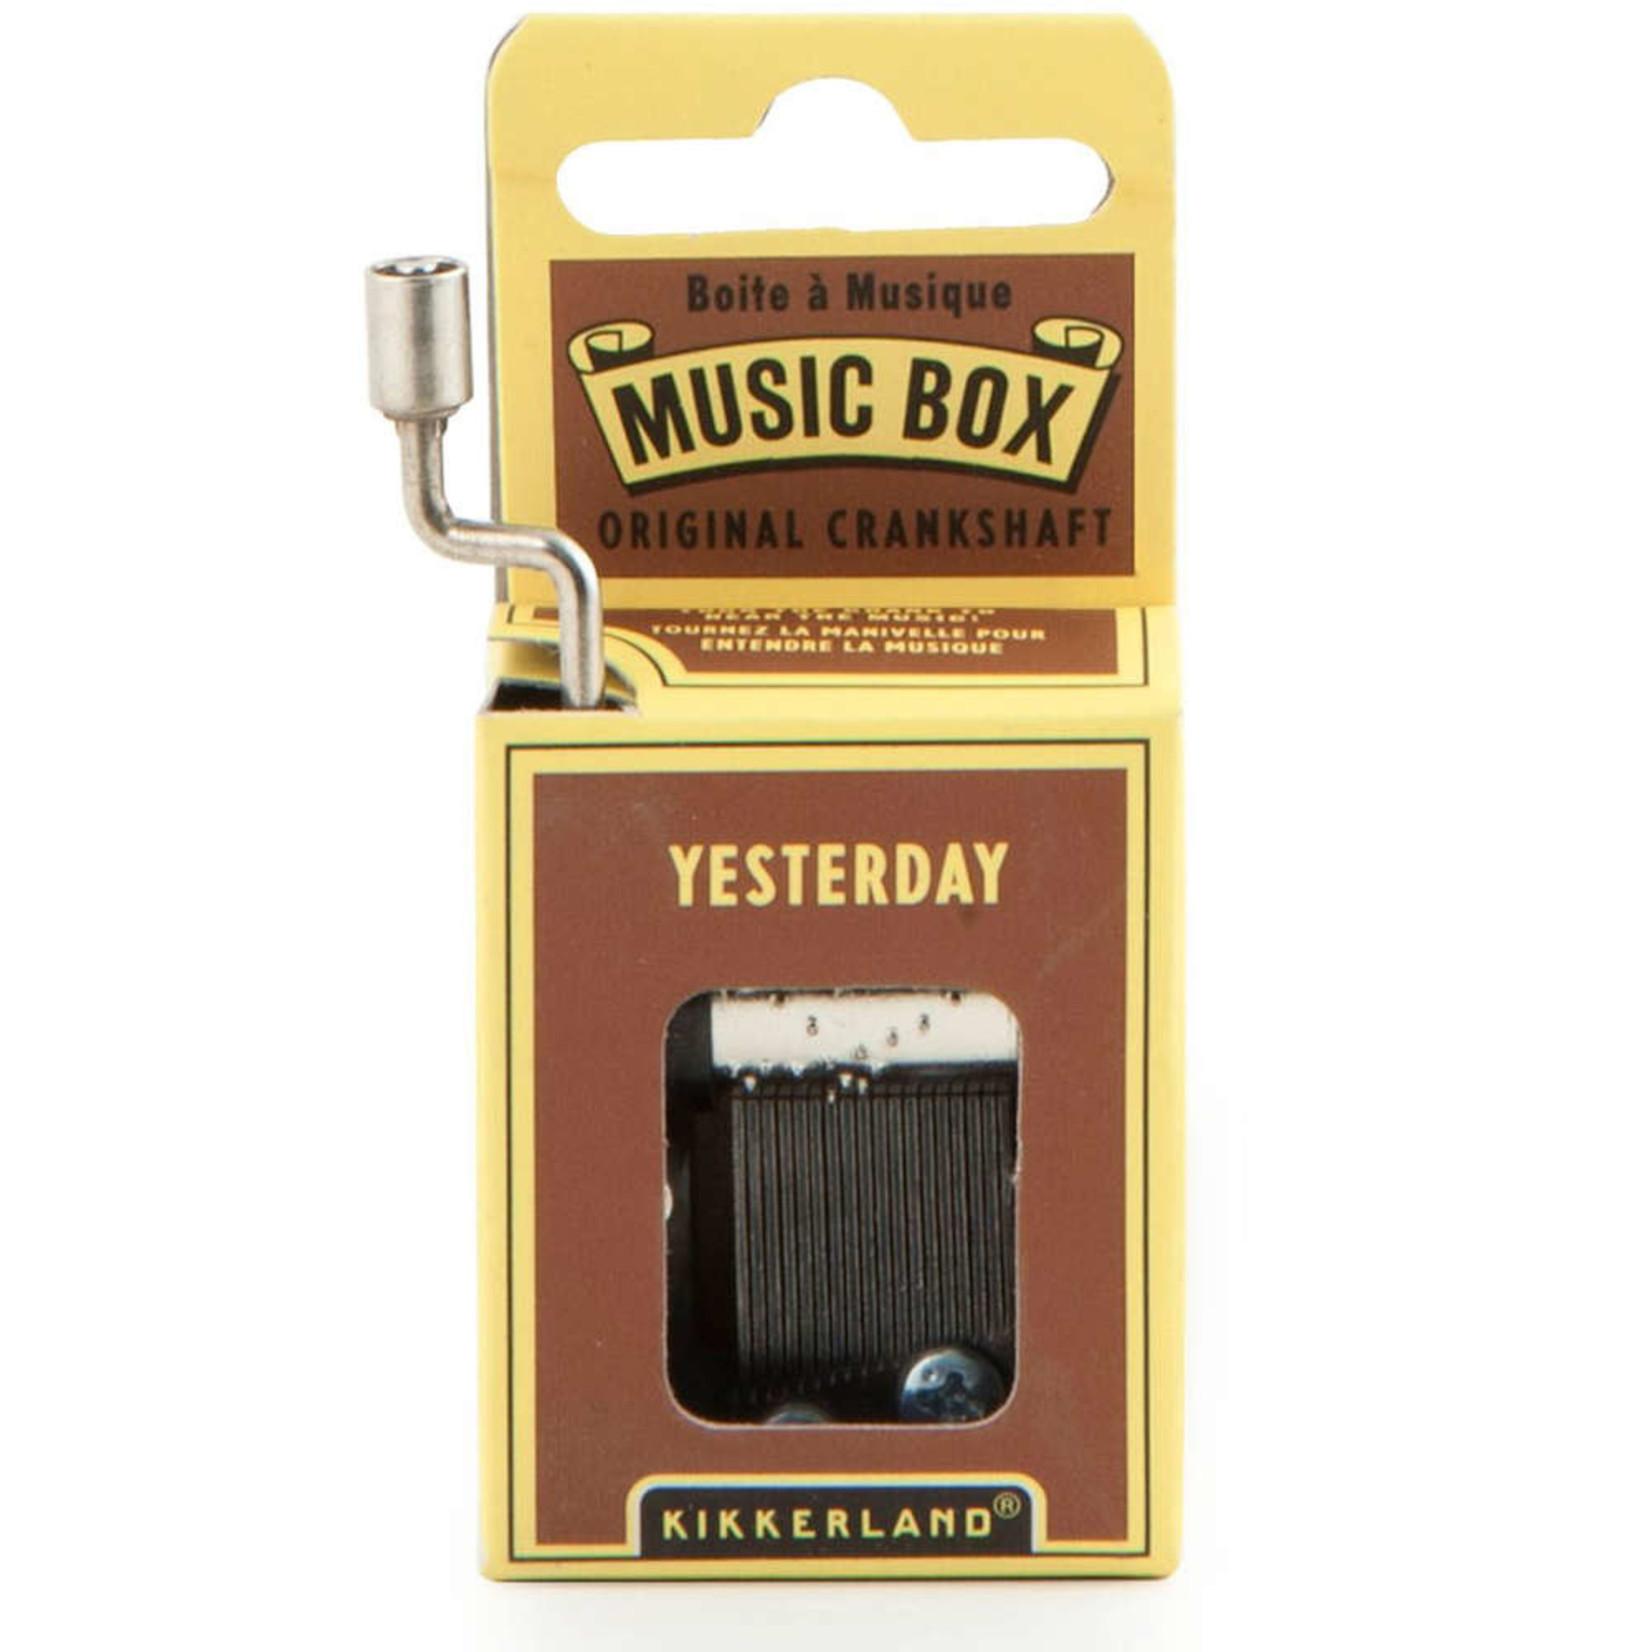 KIKKERLAND YESTERDAY MUSIC BOX